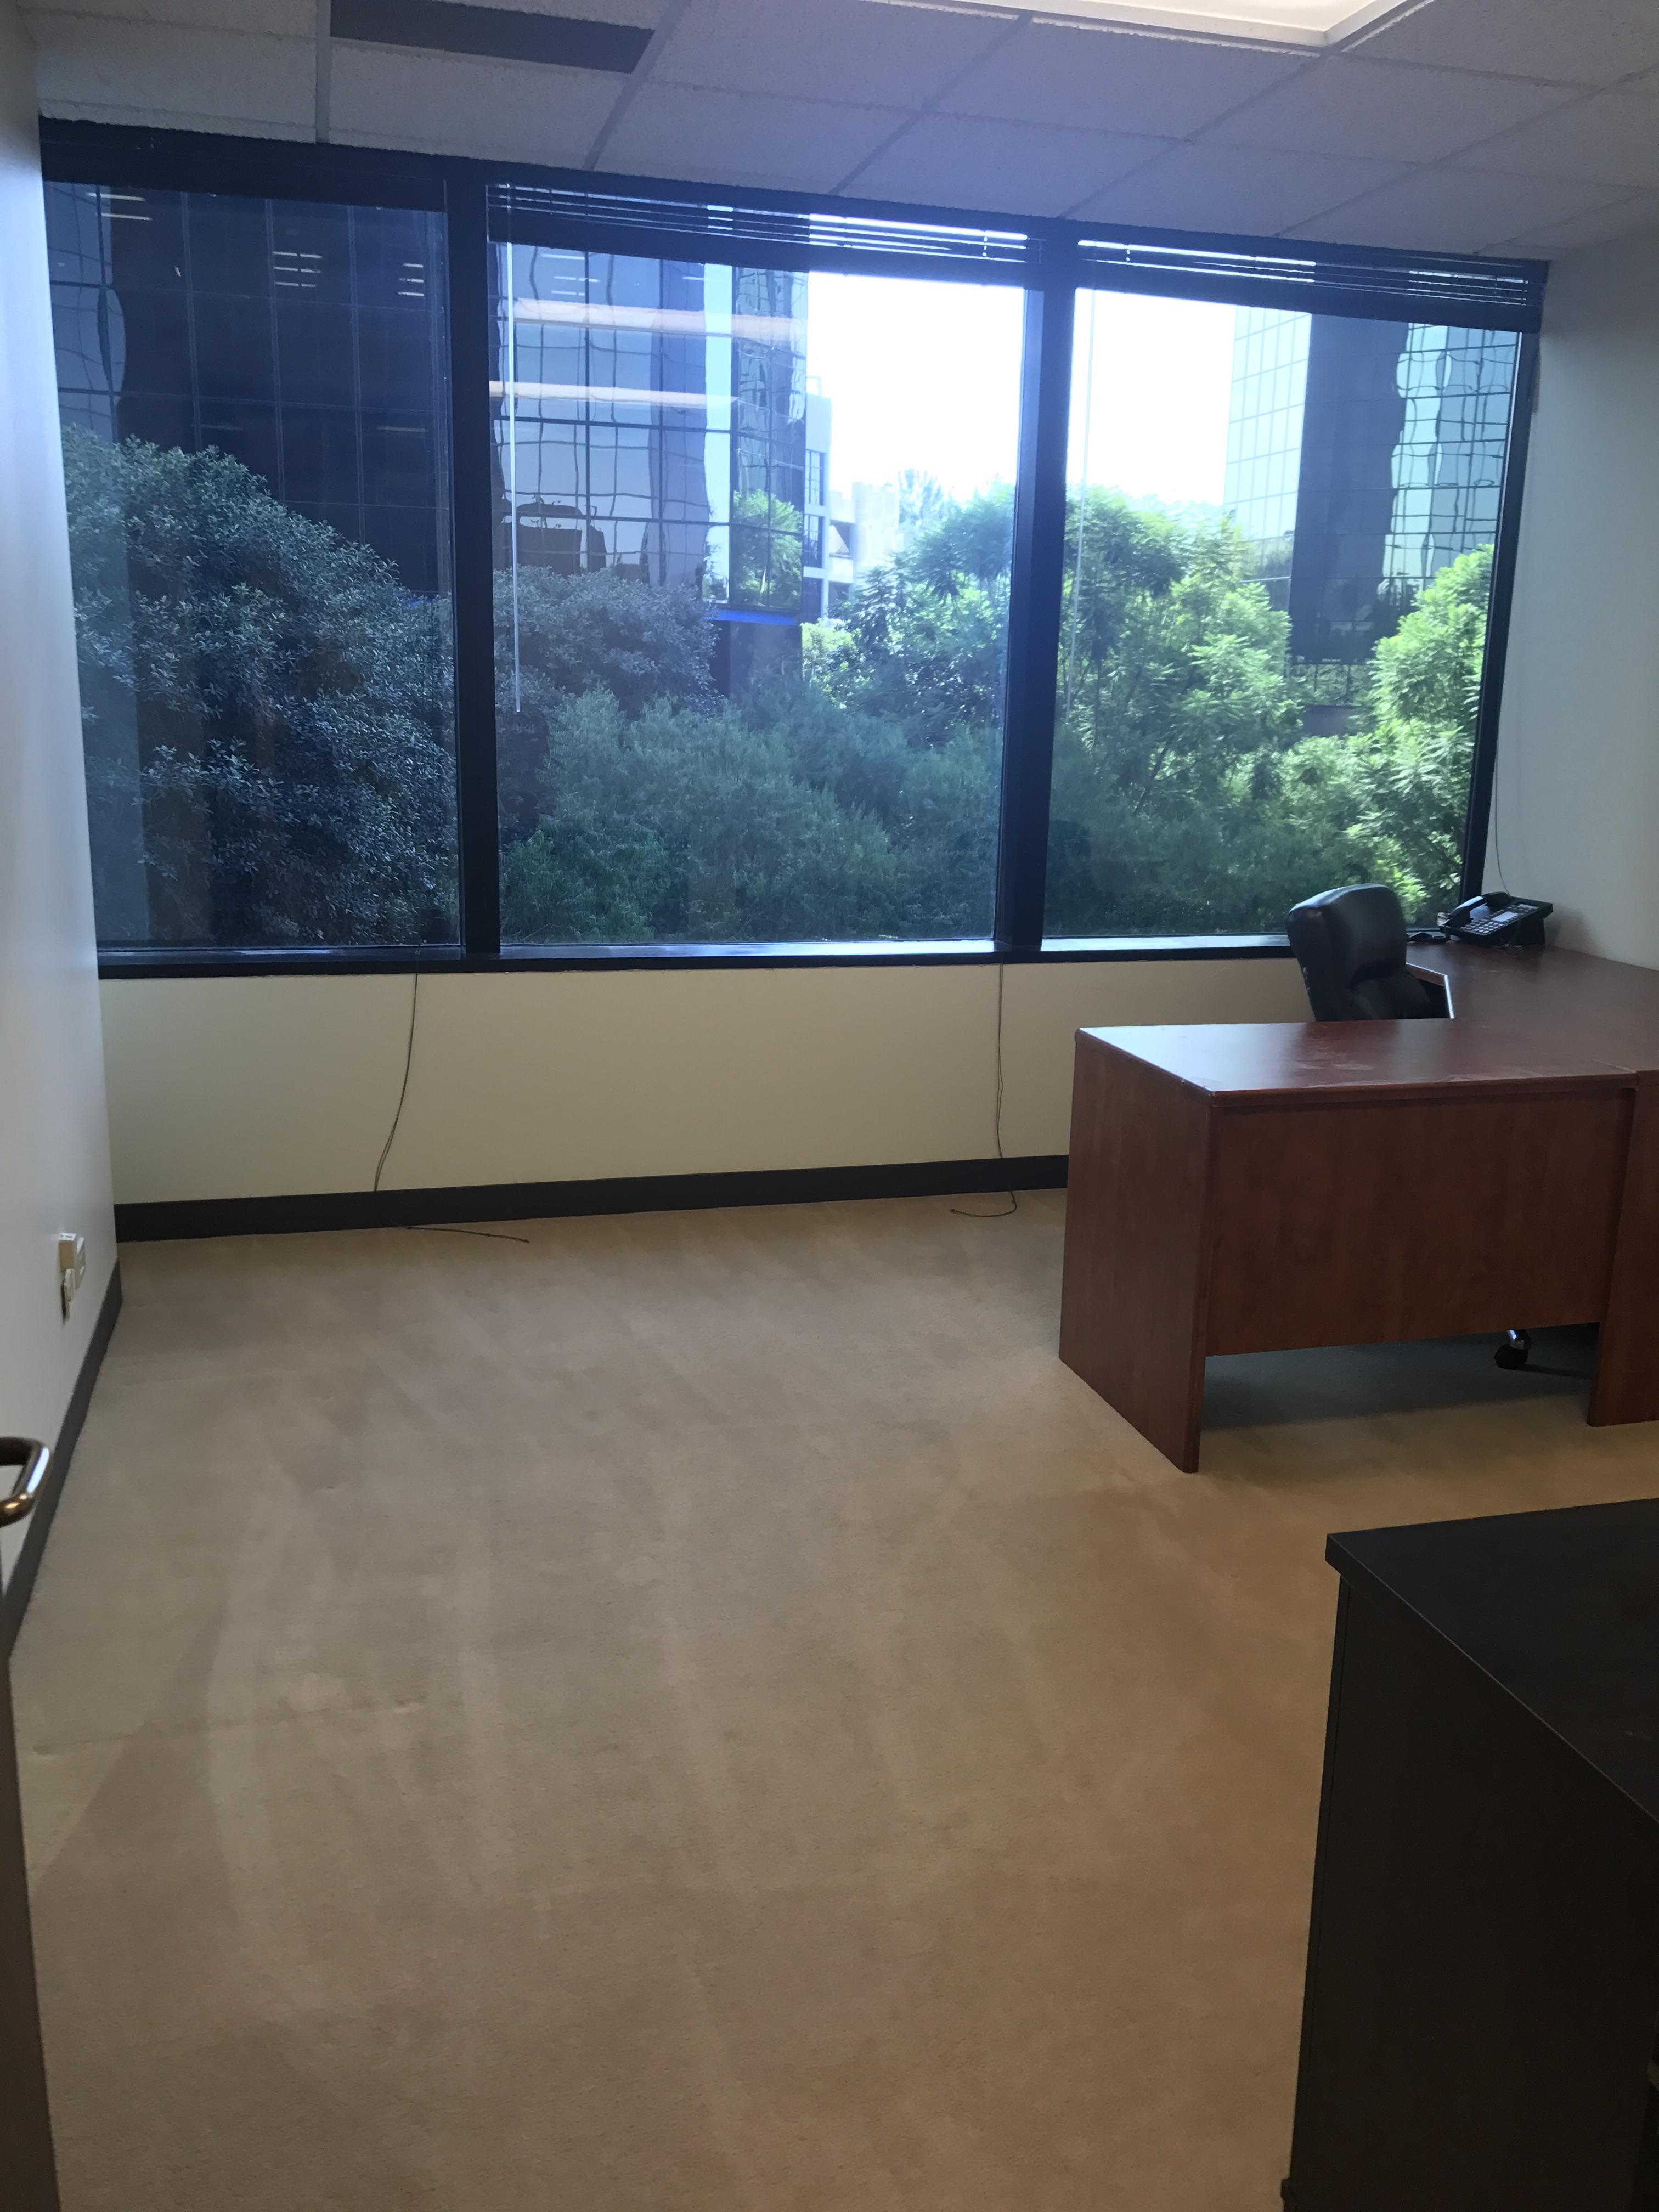 (WC2) Warner Center Towers - Office 10!  Window Team Office